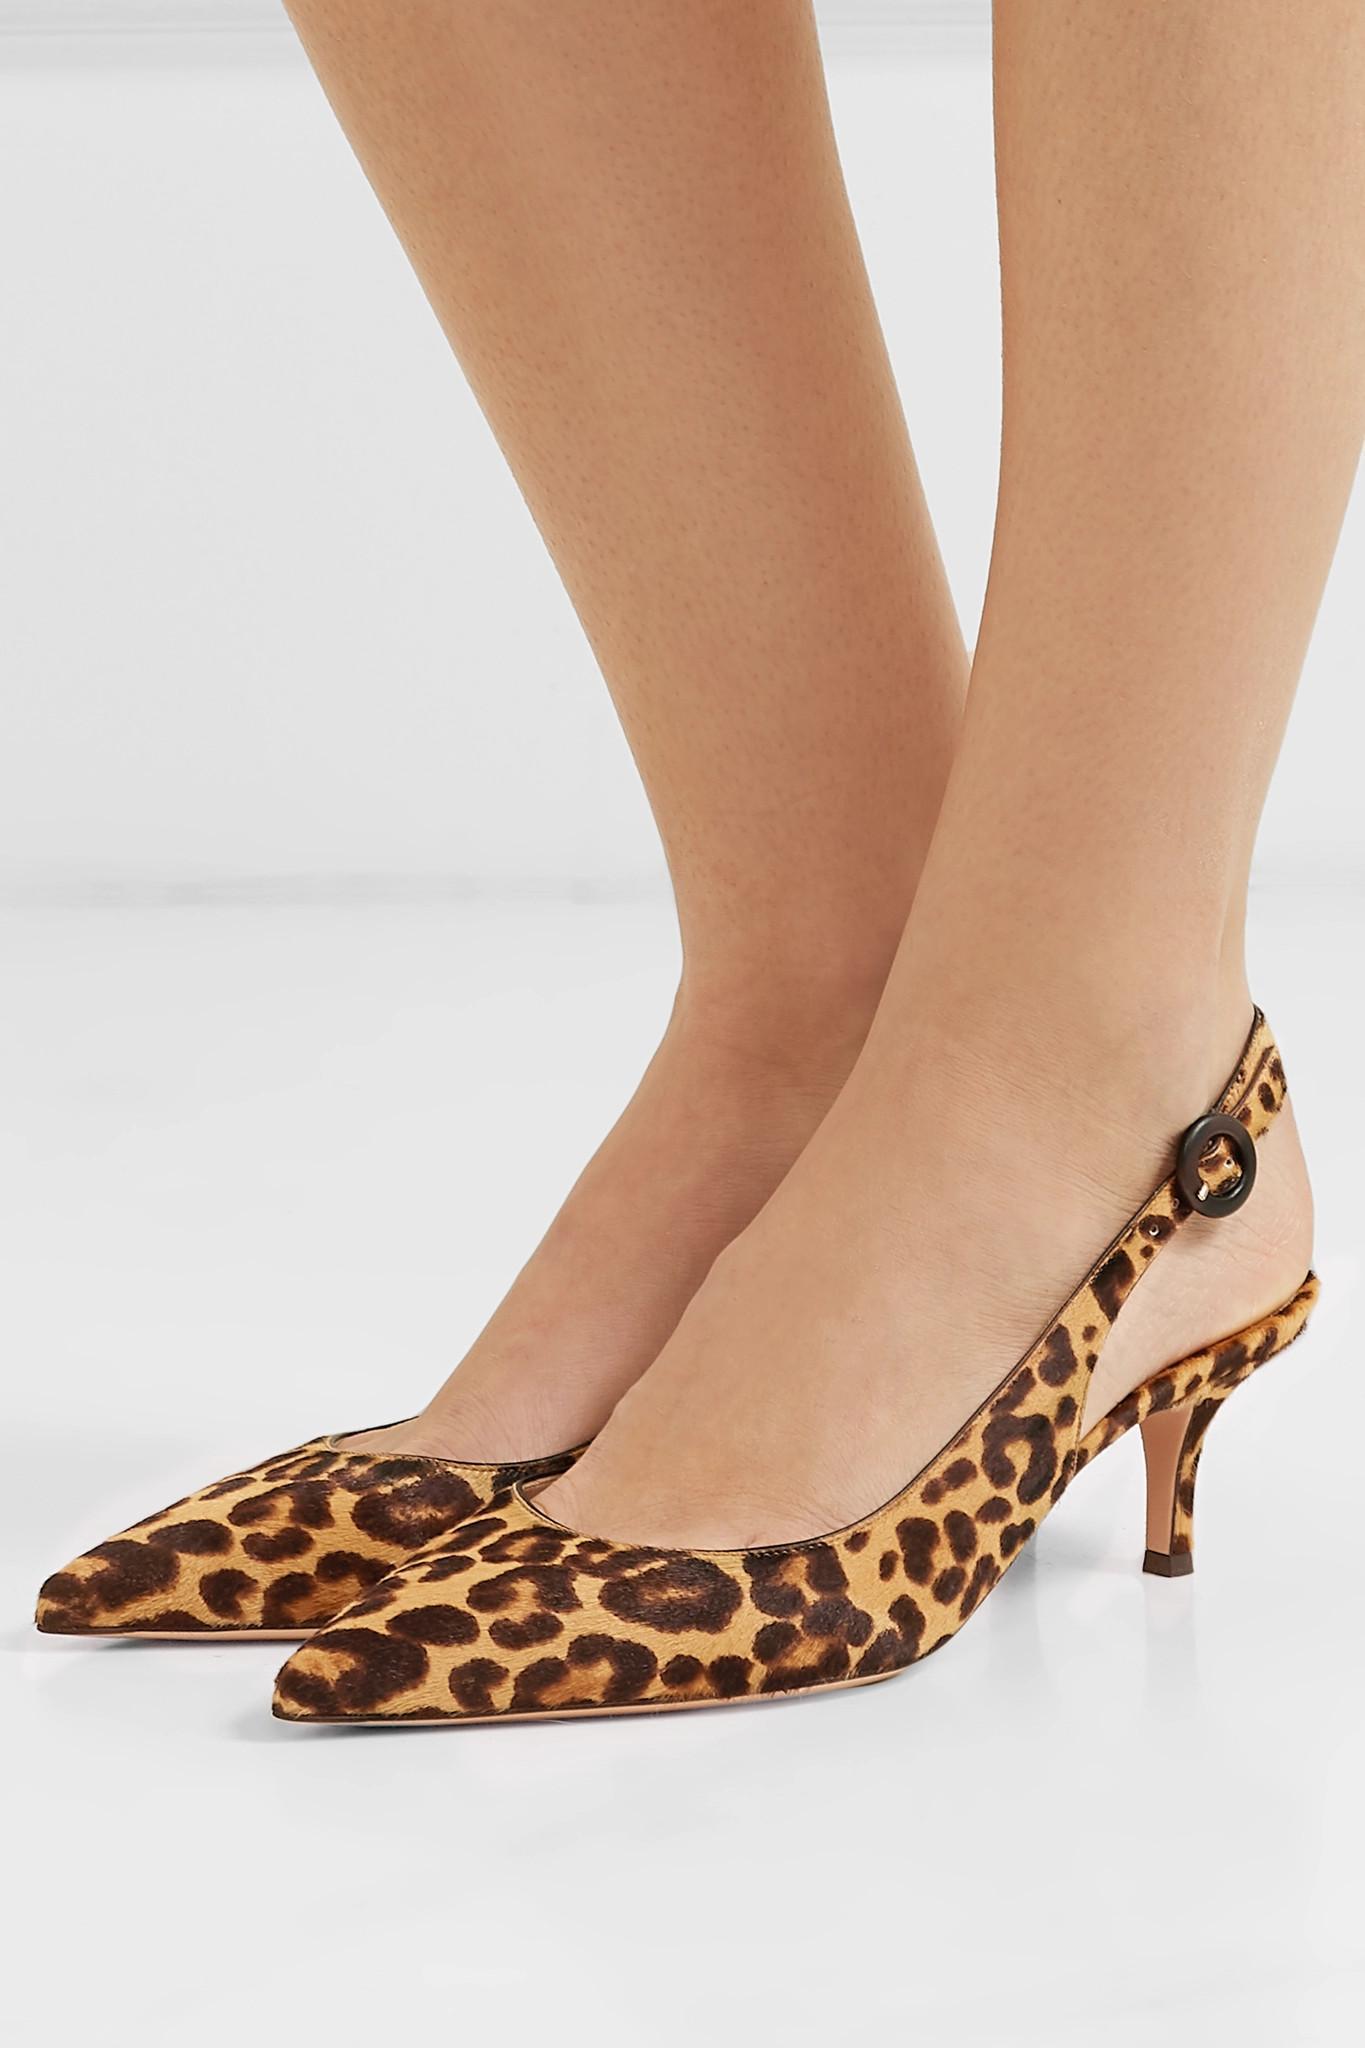 8a27041b6c1f Gianvito Rossi - Brown Anna Leopard-print Calf Hair Slingback Pumps - Lyst.  View fullscreen